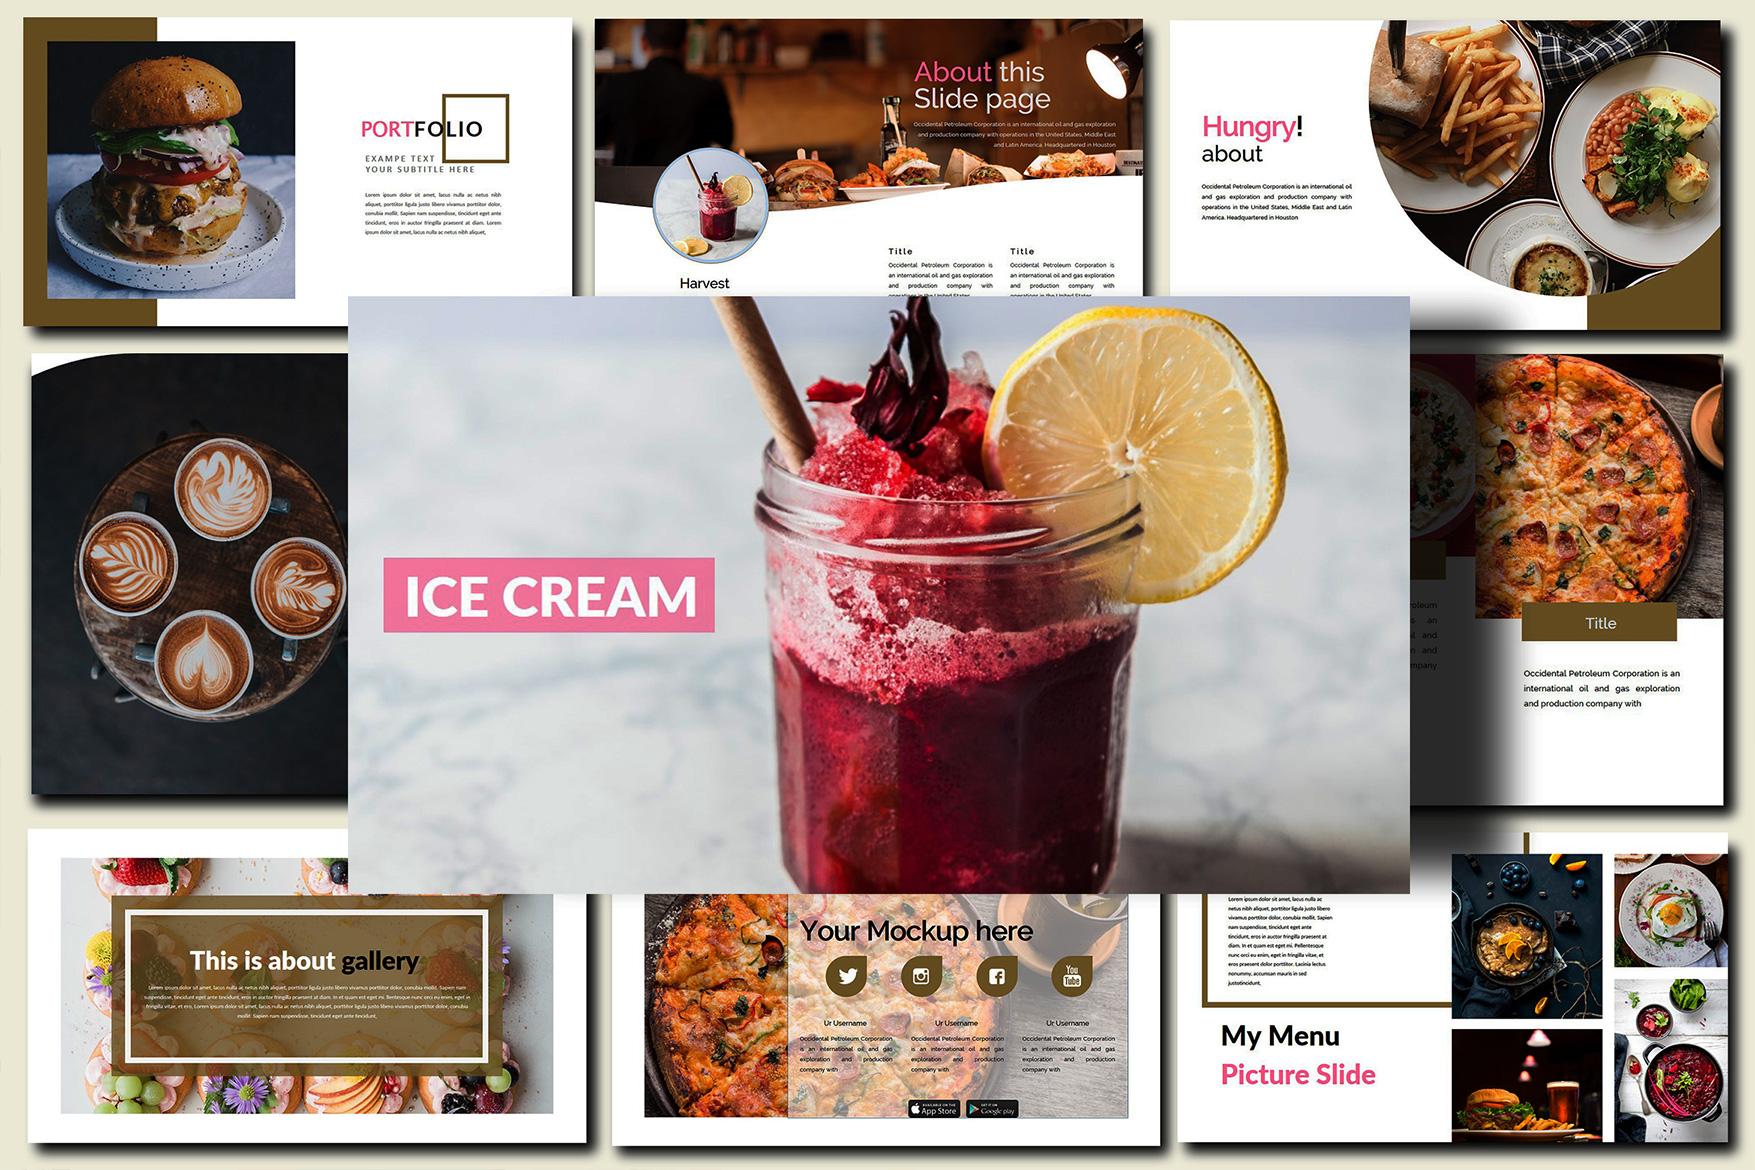 Delicious Food - Google Slides Presentation example image 4